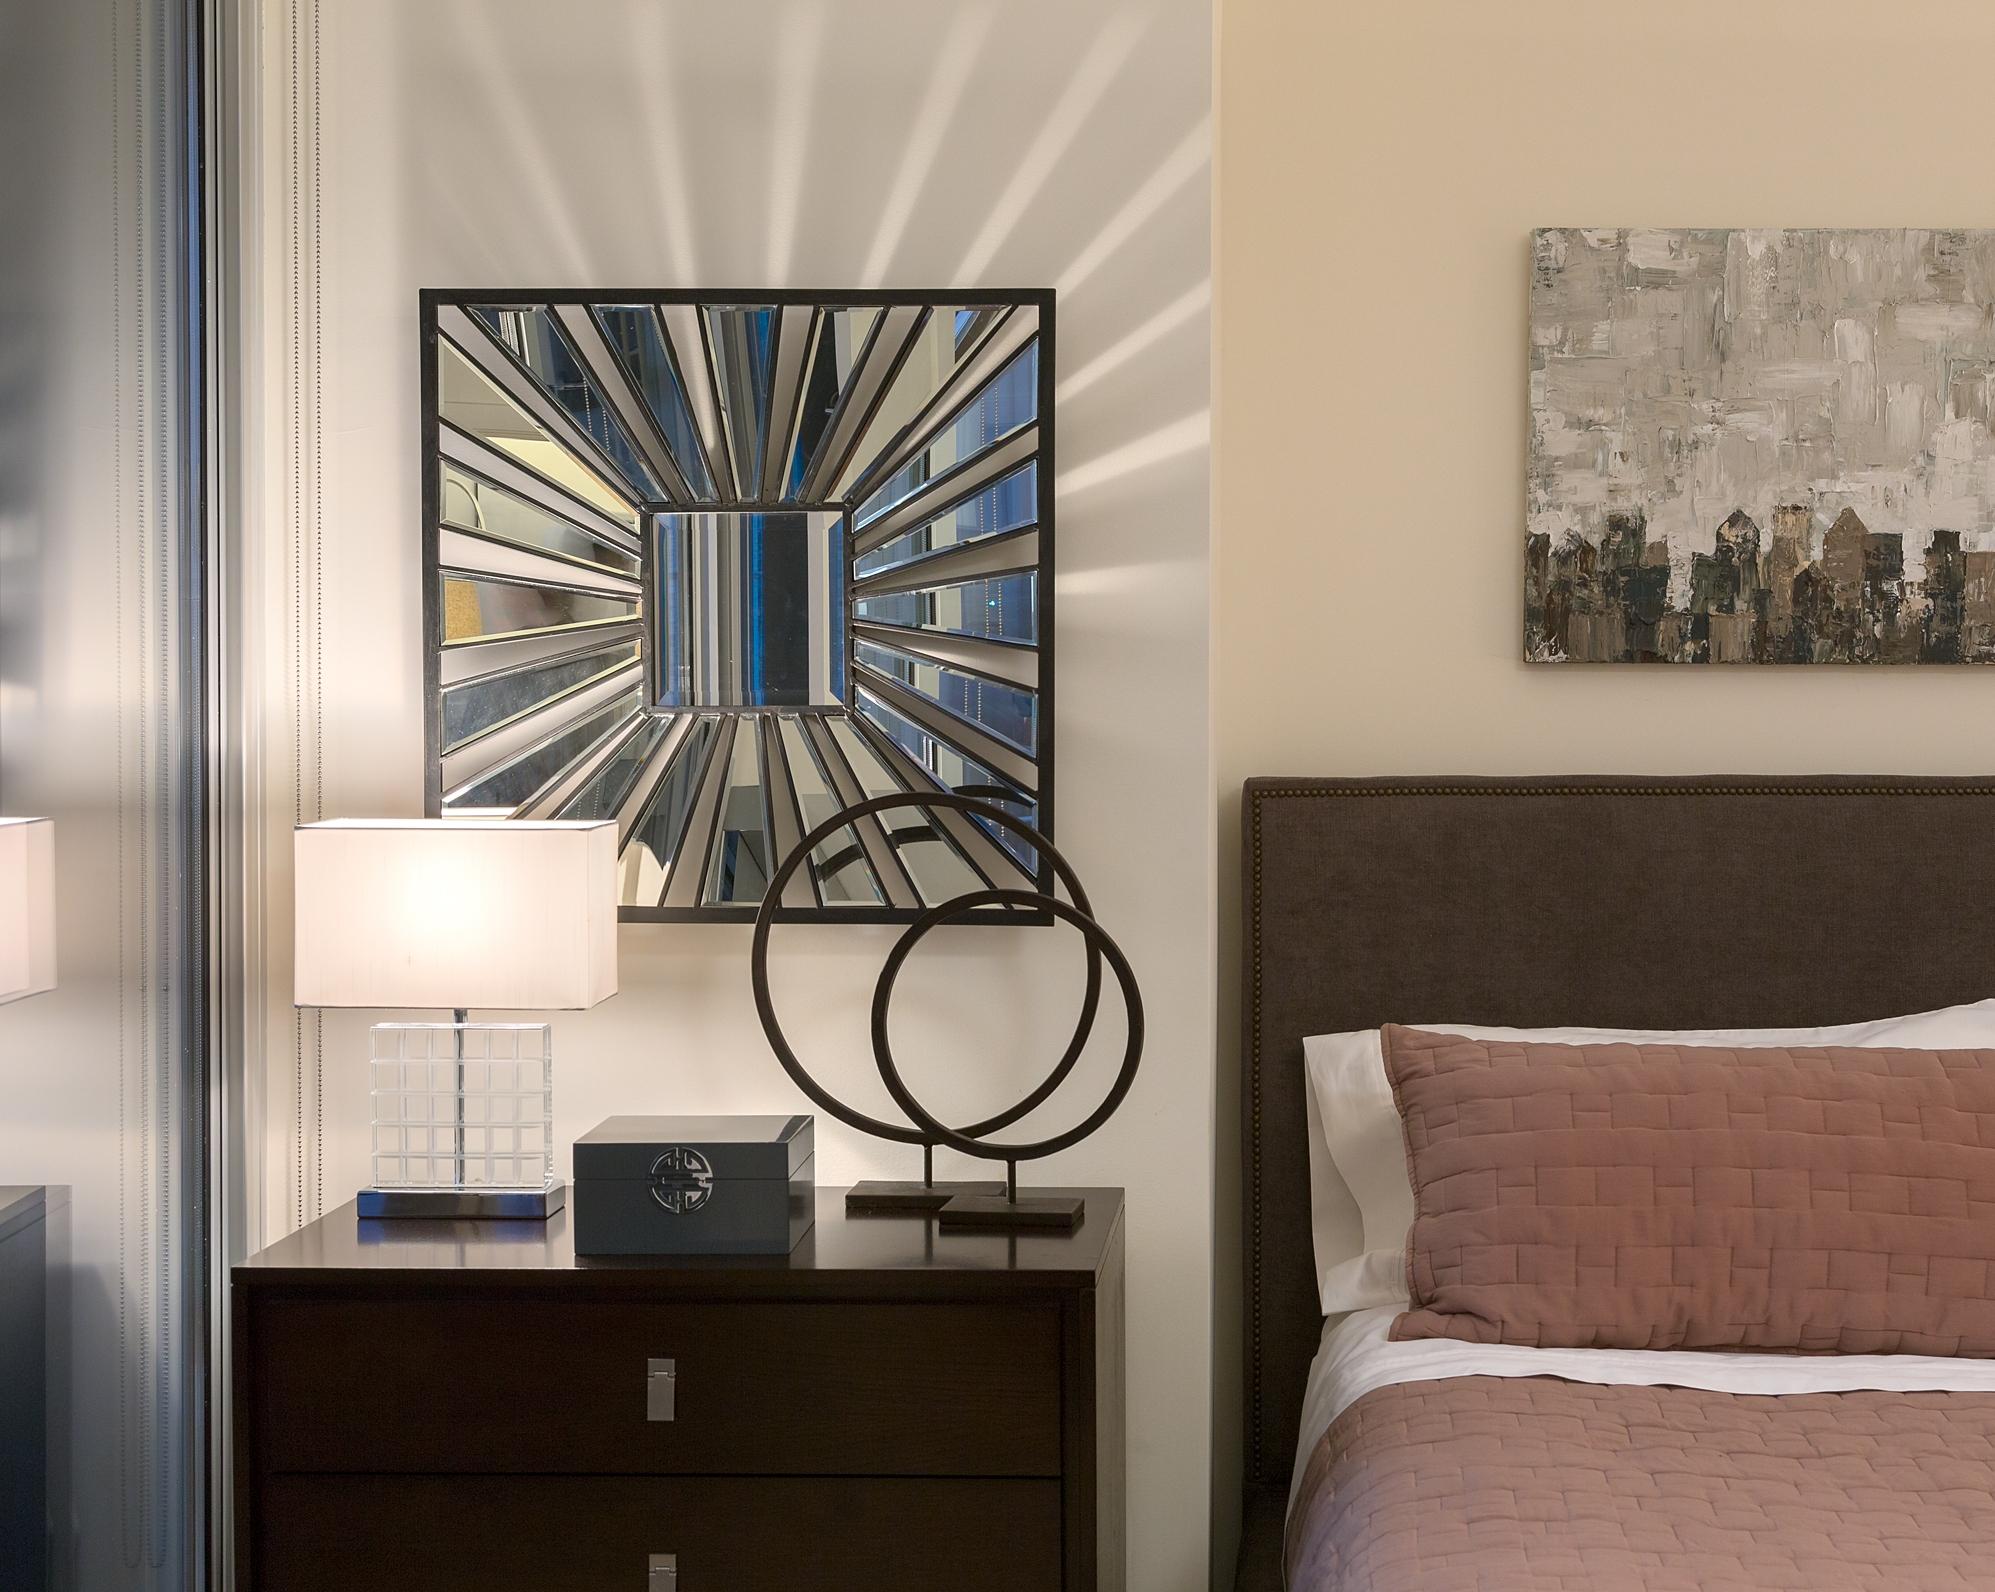 Refresh Decorating - Condo Master Bedroom Mirror Light Rays.jpg